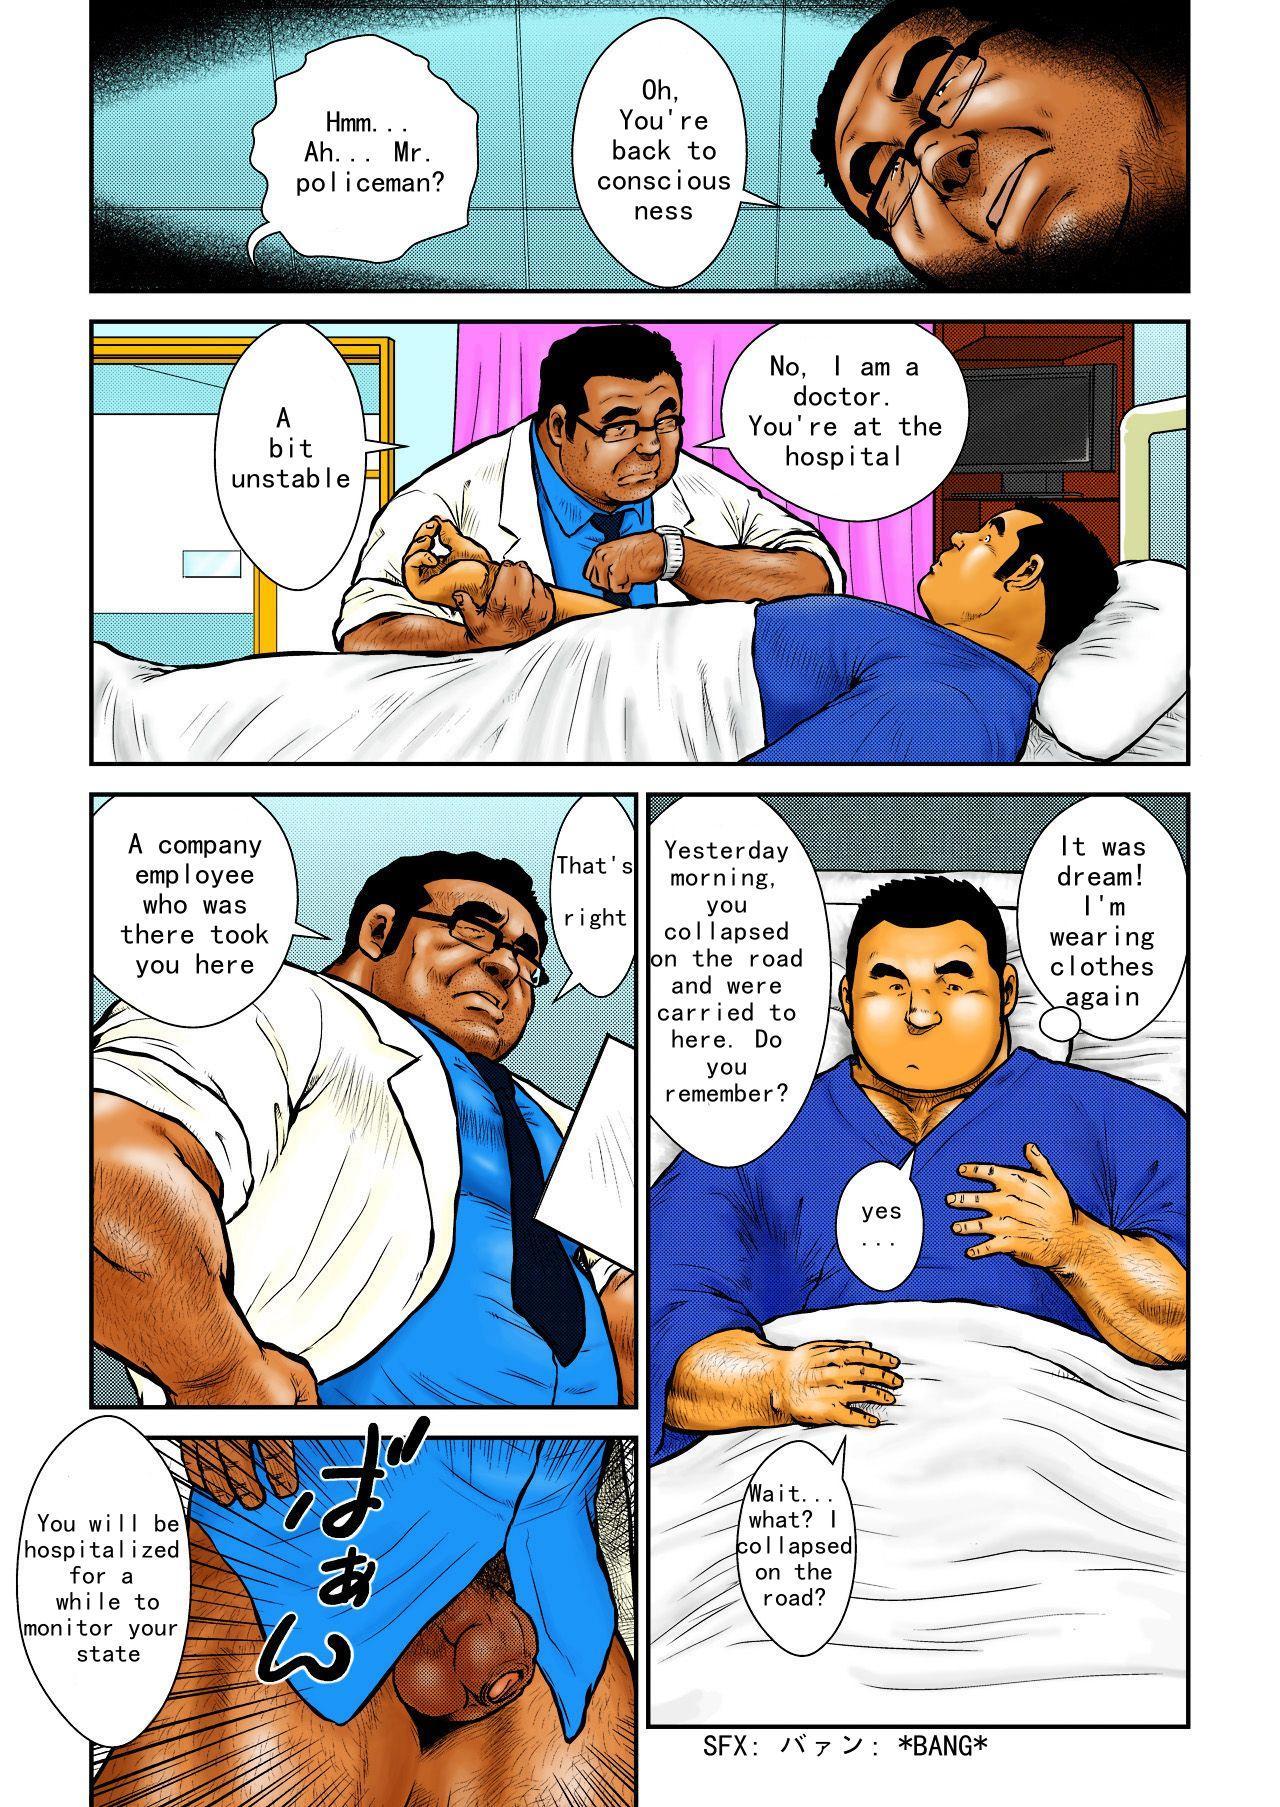 Honjitsu wa Zenra Day | Today is Naked Day 14